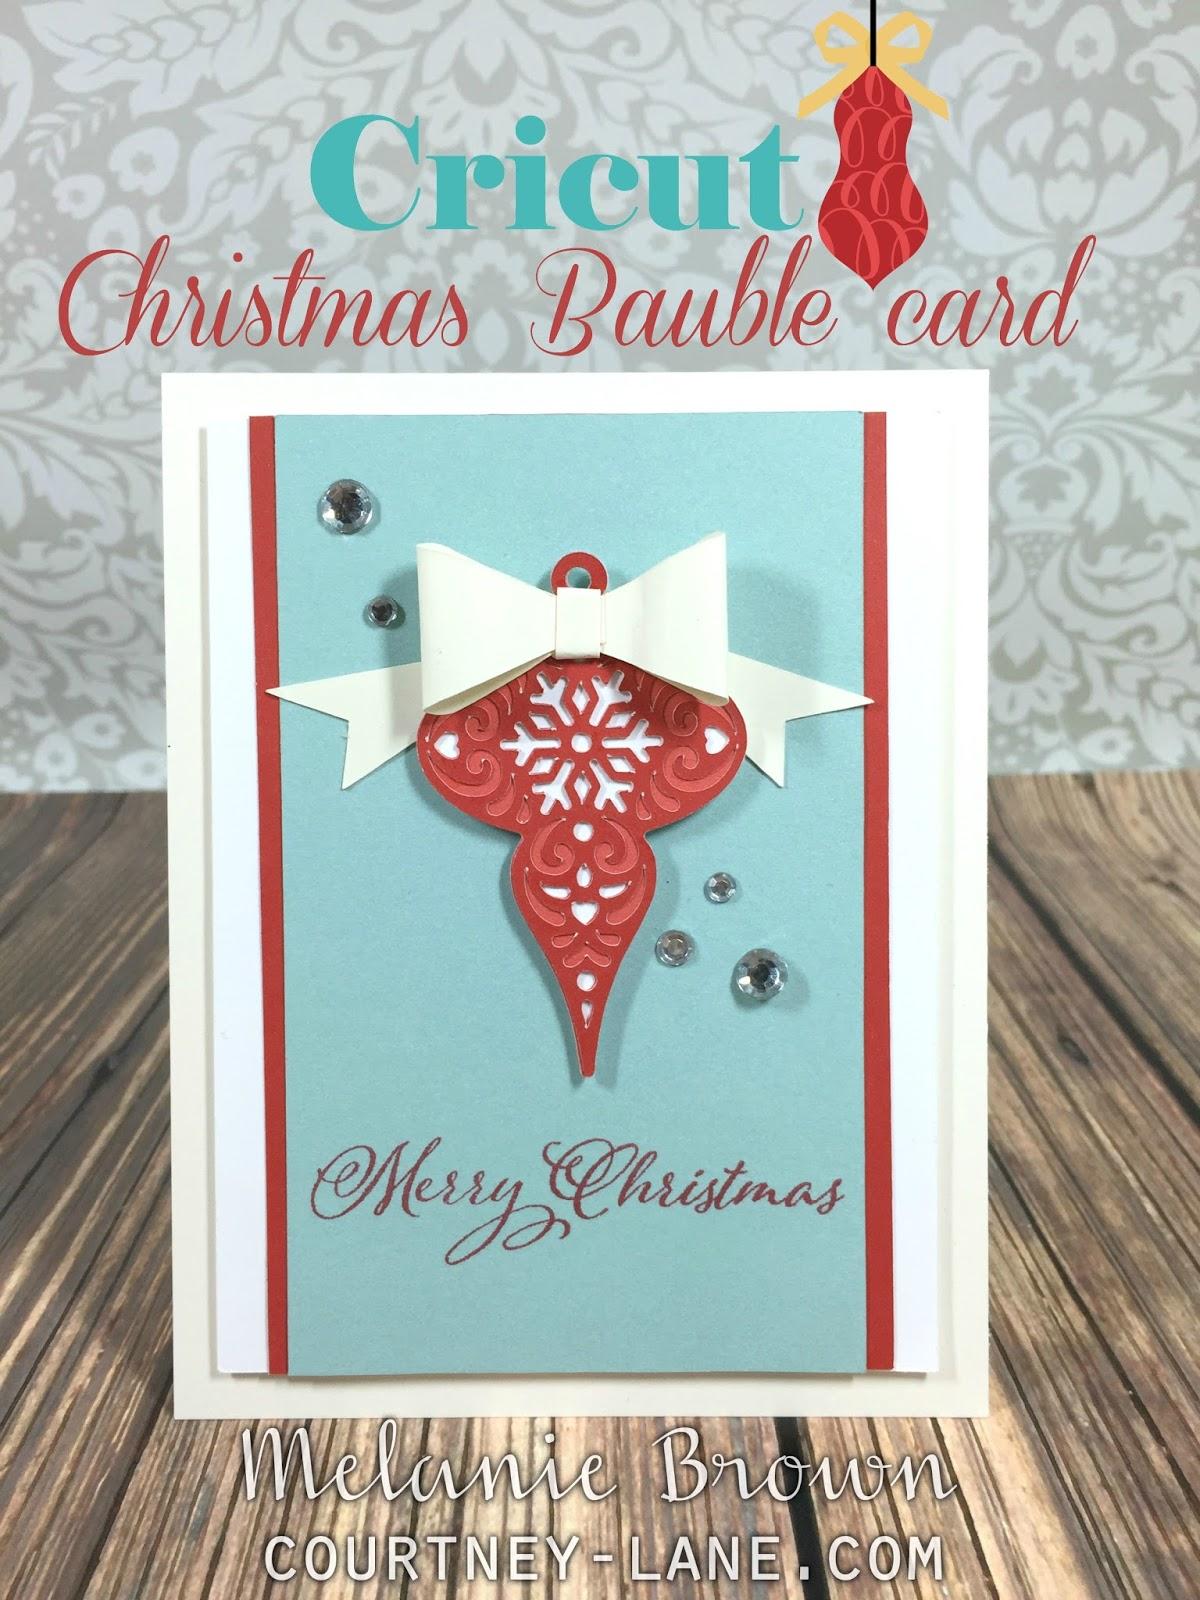 Courtney Lane Designs: Cricut Christmas Bauble card